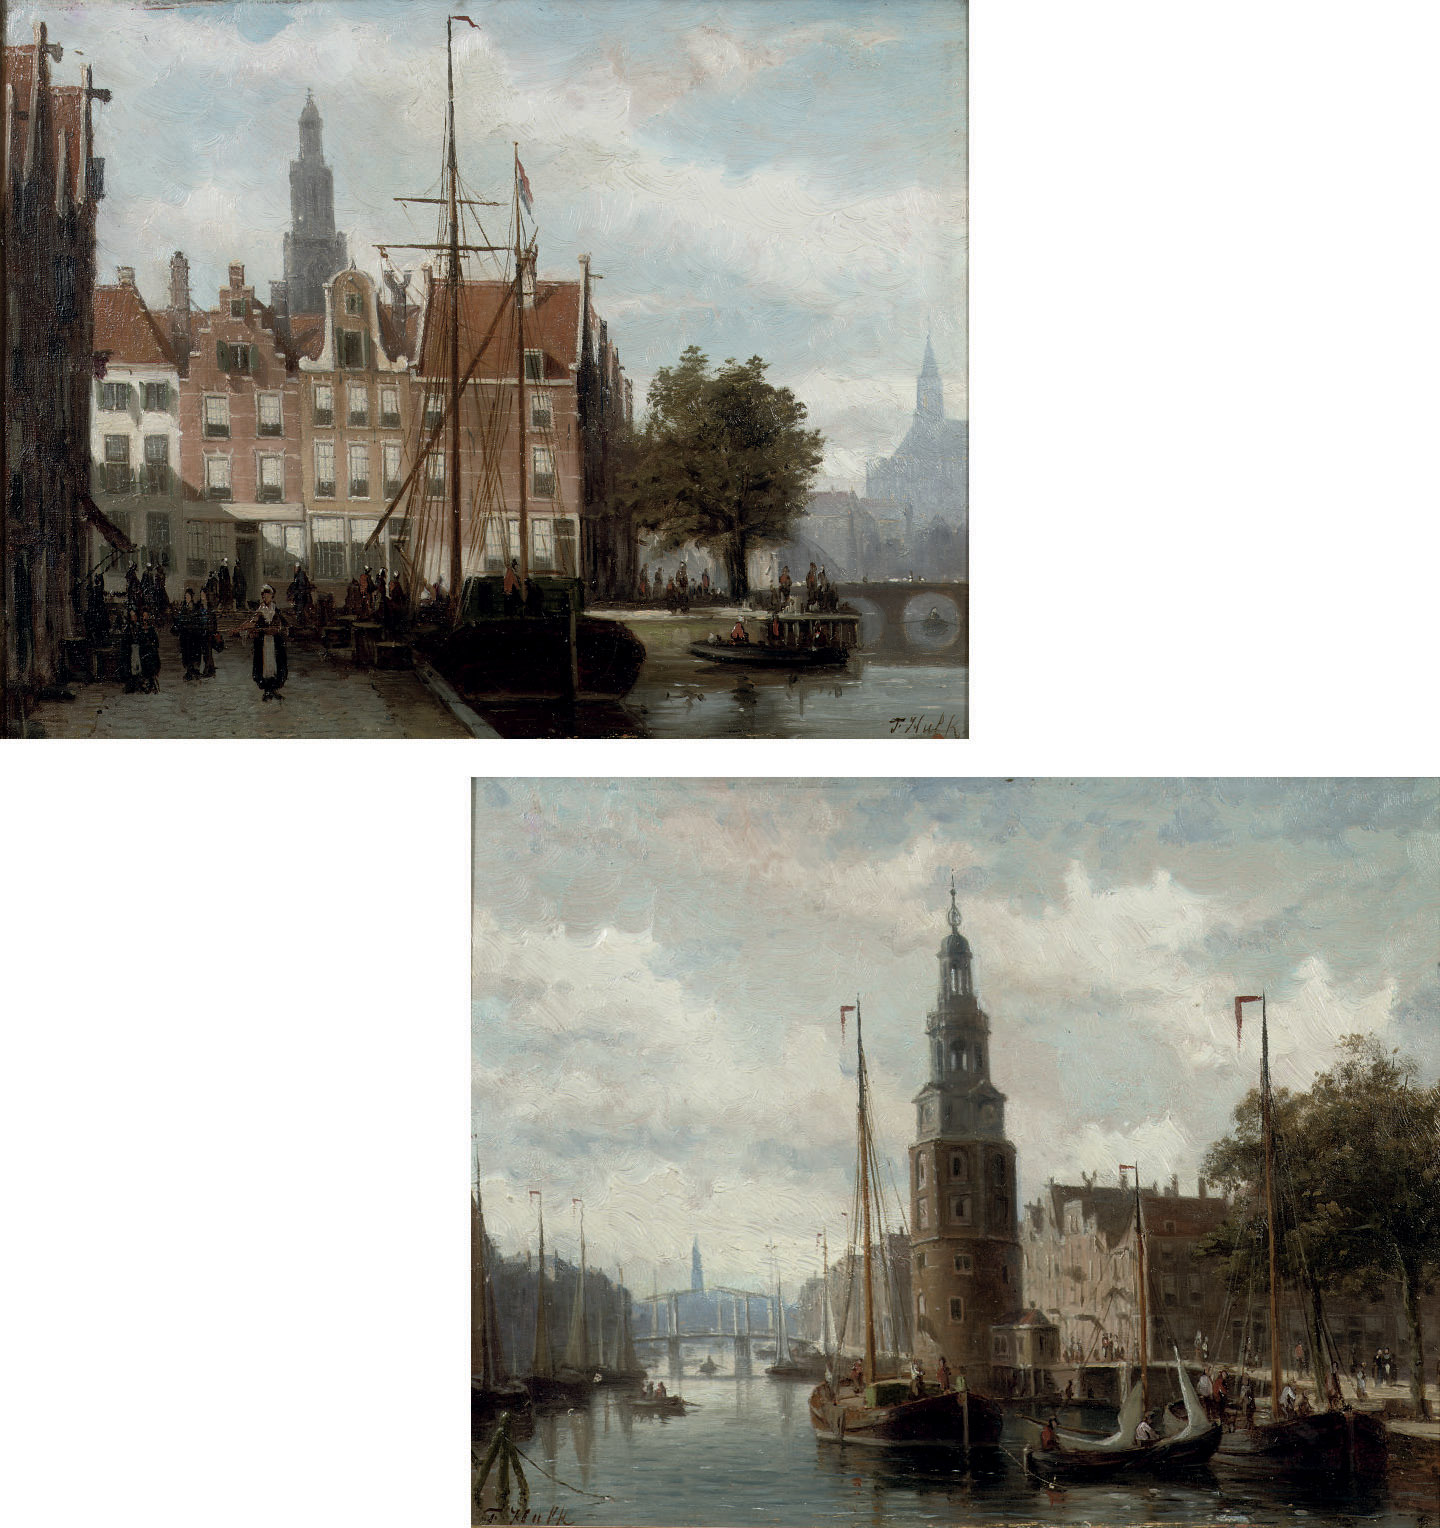 The Montelsbaantoren, Amsterdam; and A view of the Spaarne, Haarlem